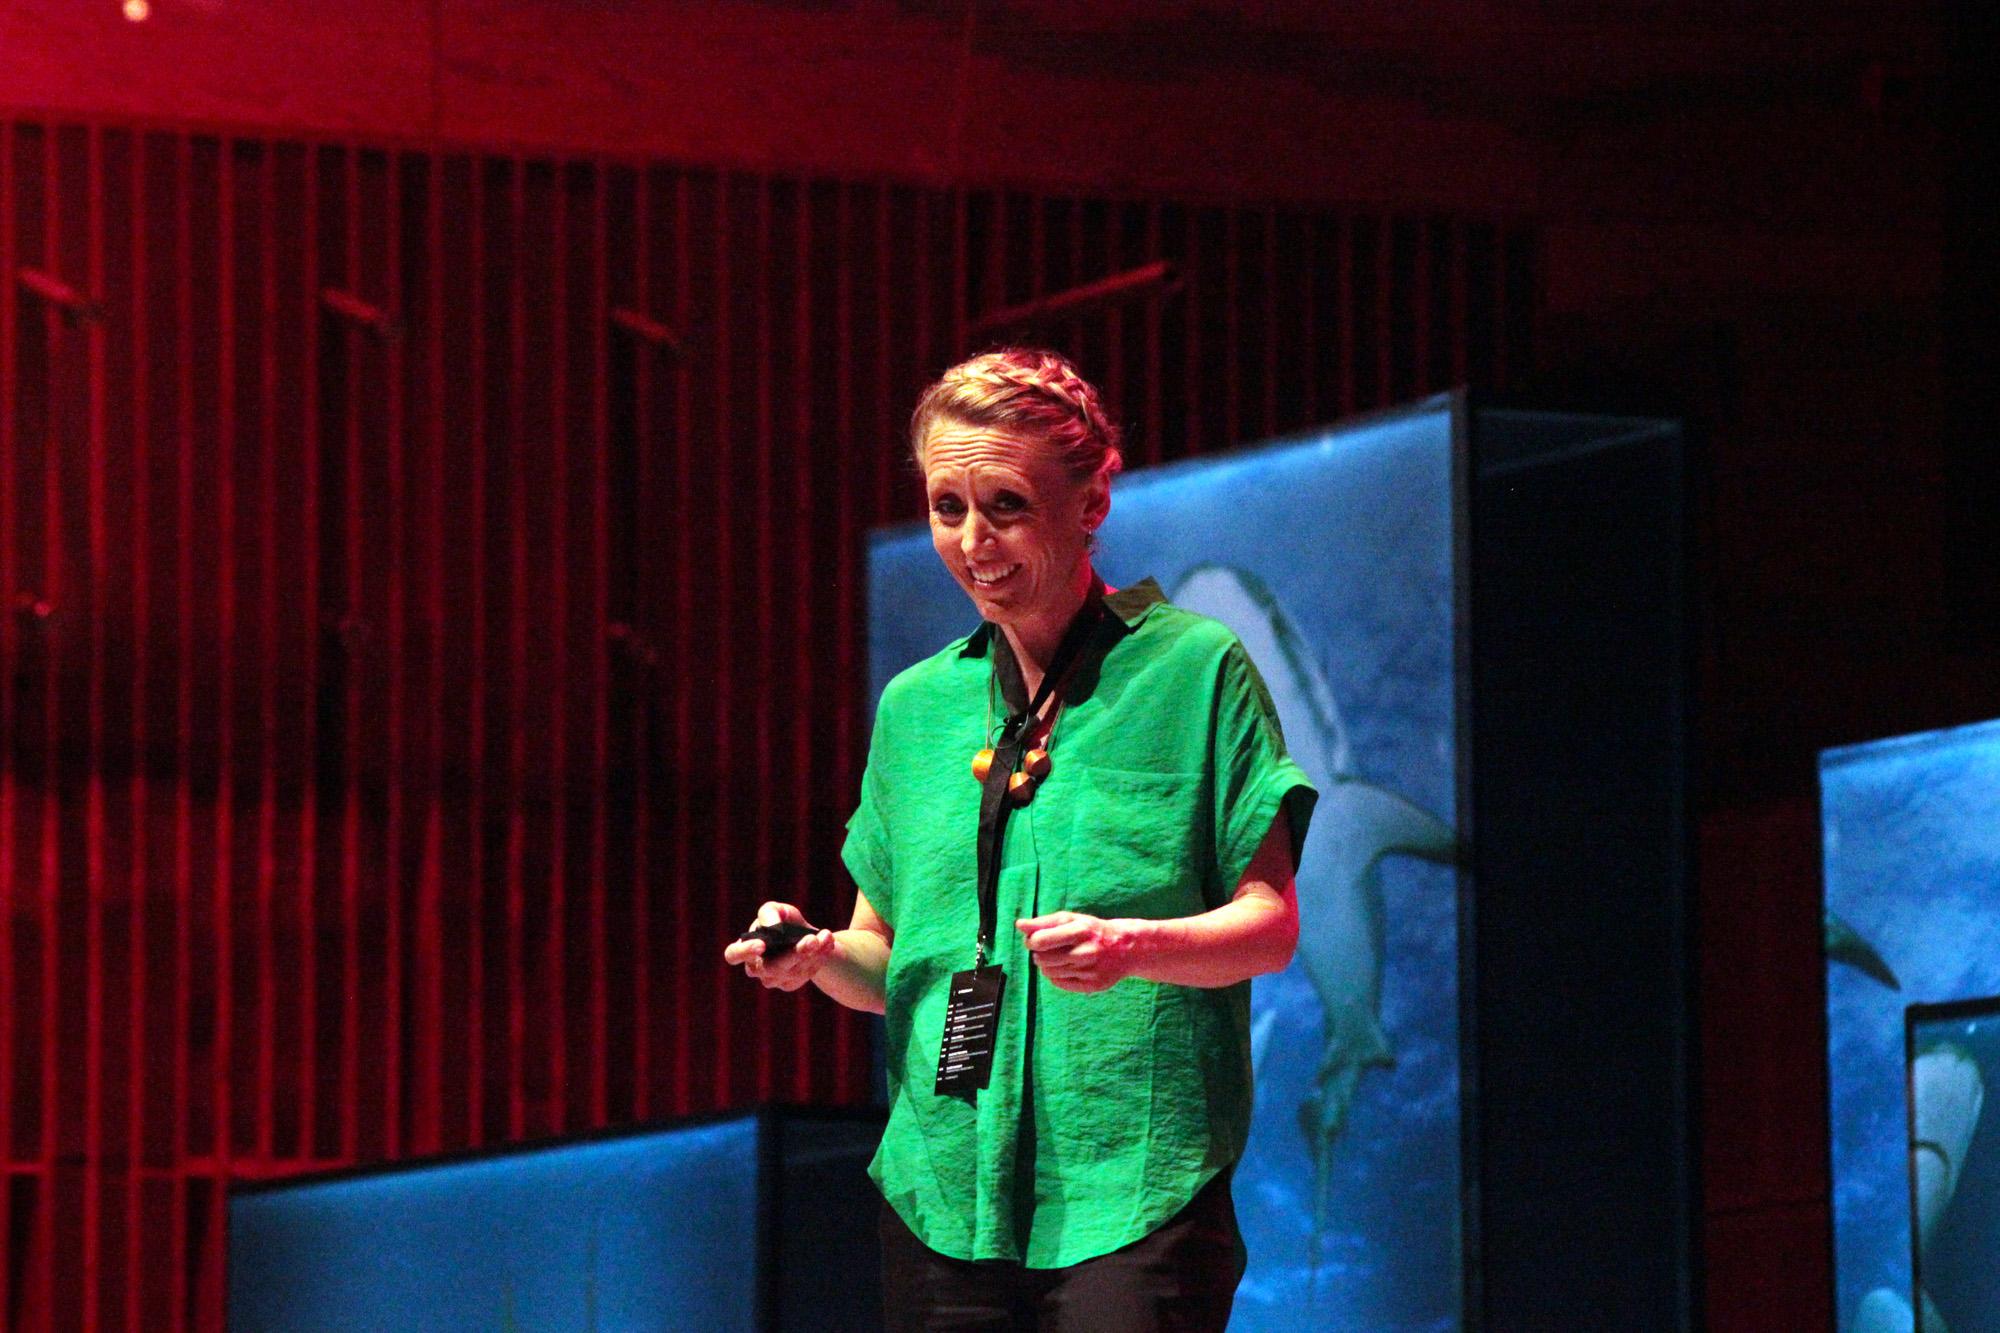 Lucy Hawkes é bióloga e também passou pelo ational Geographic Summit.